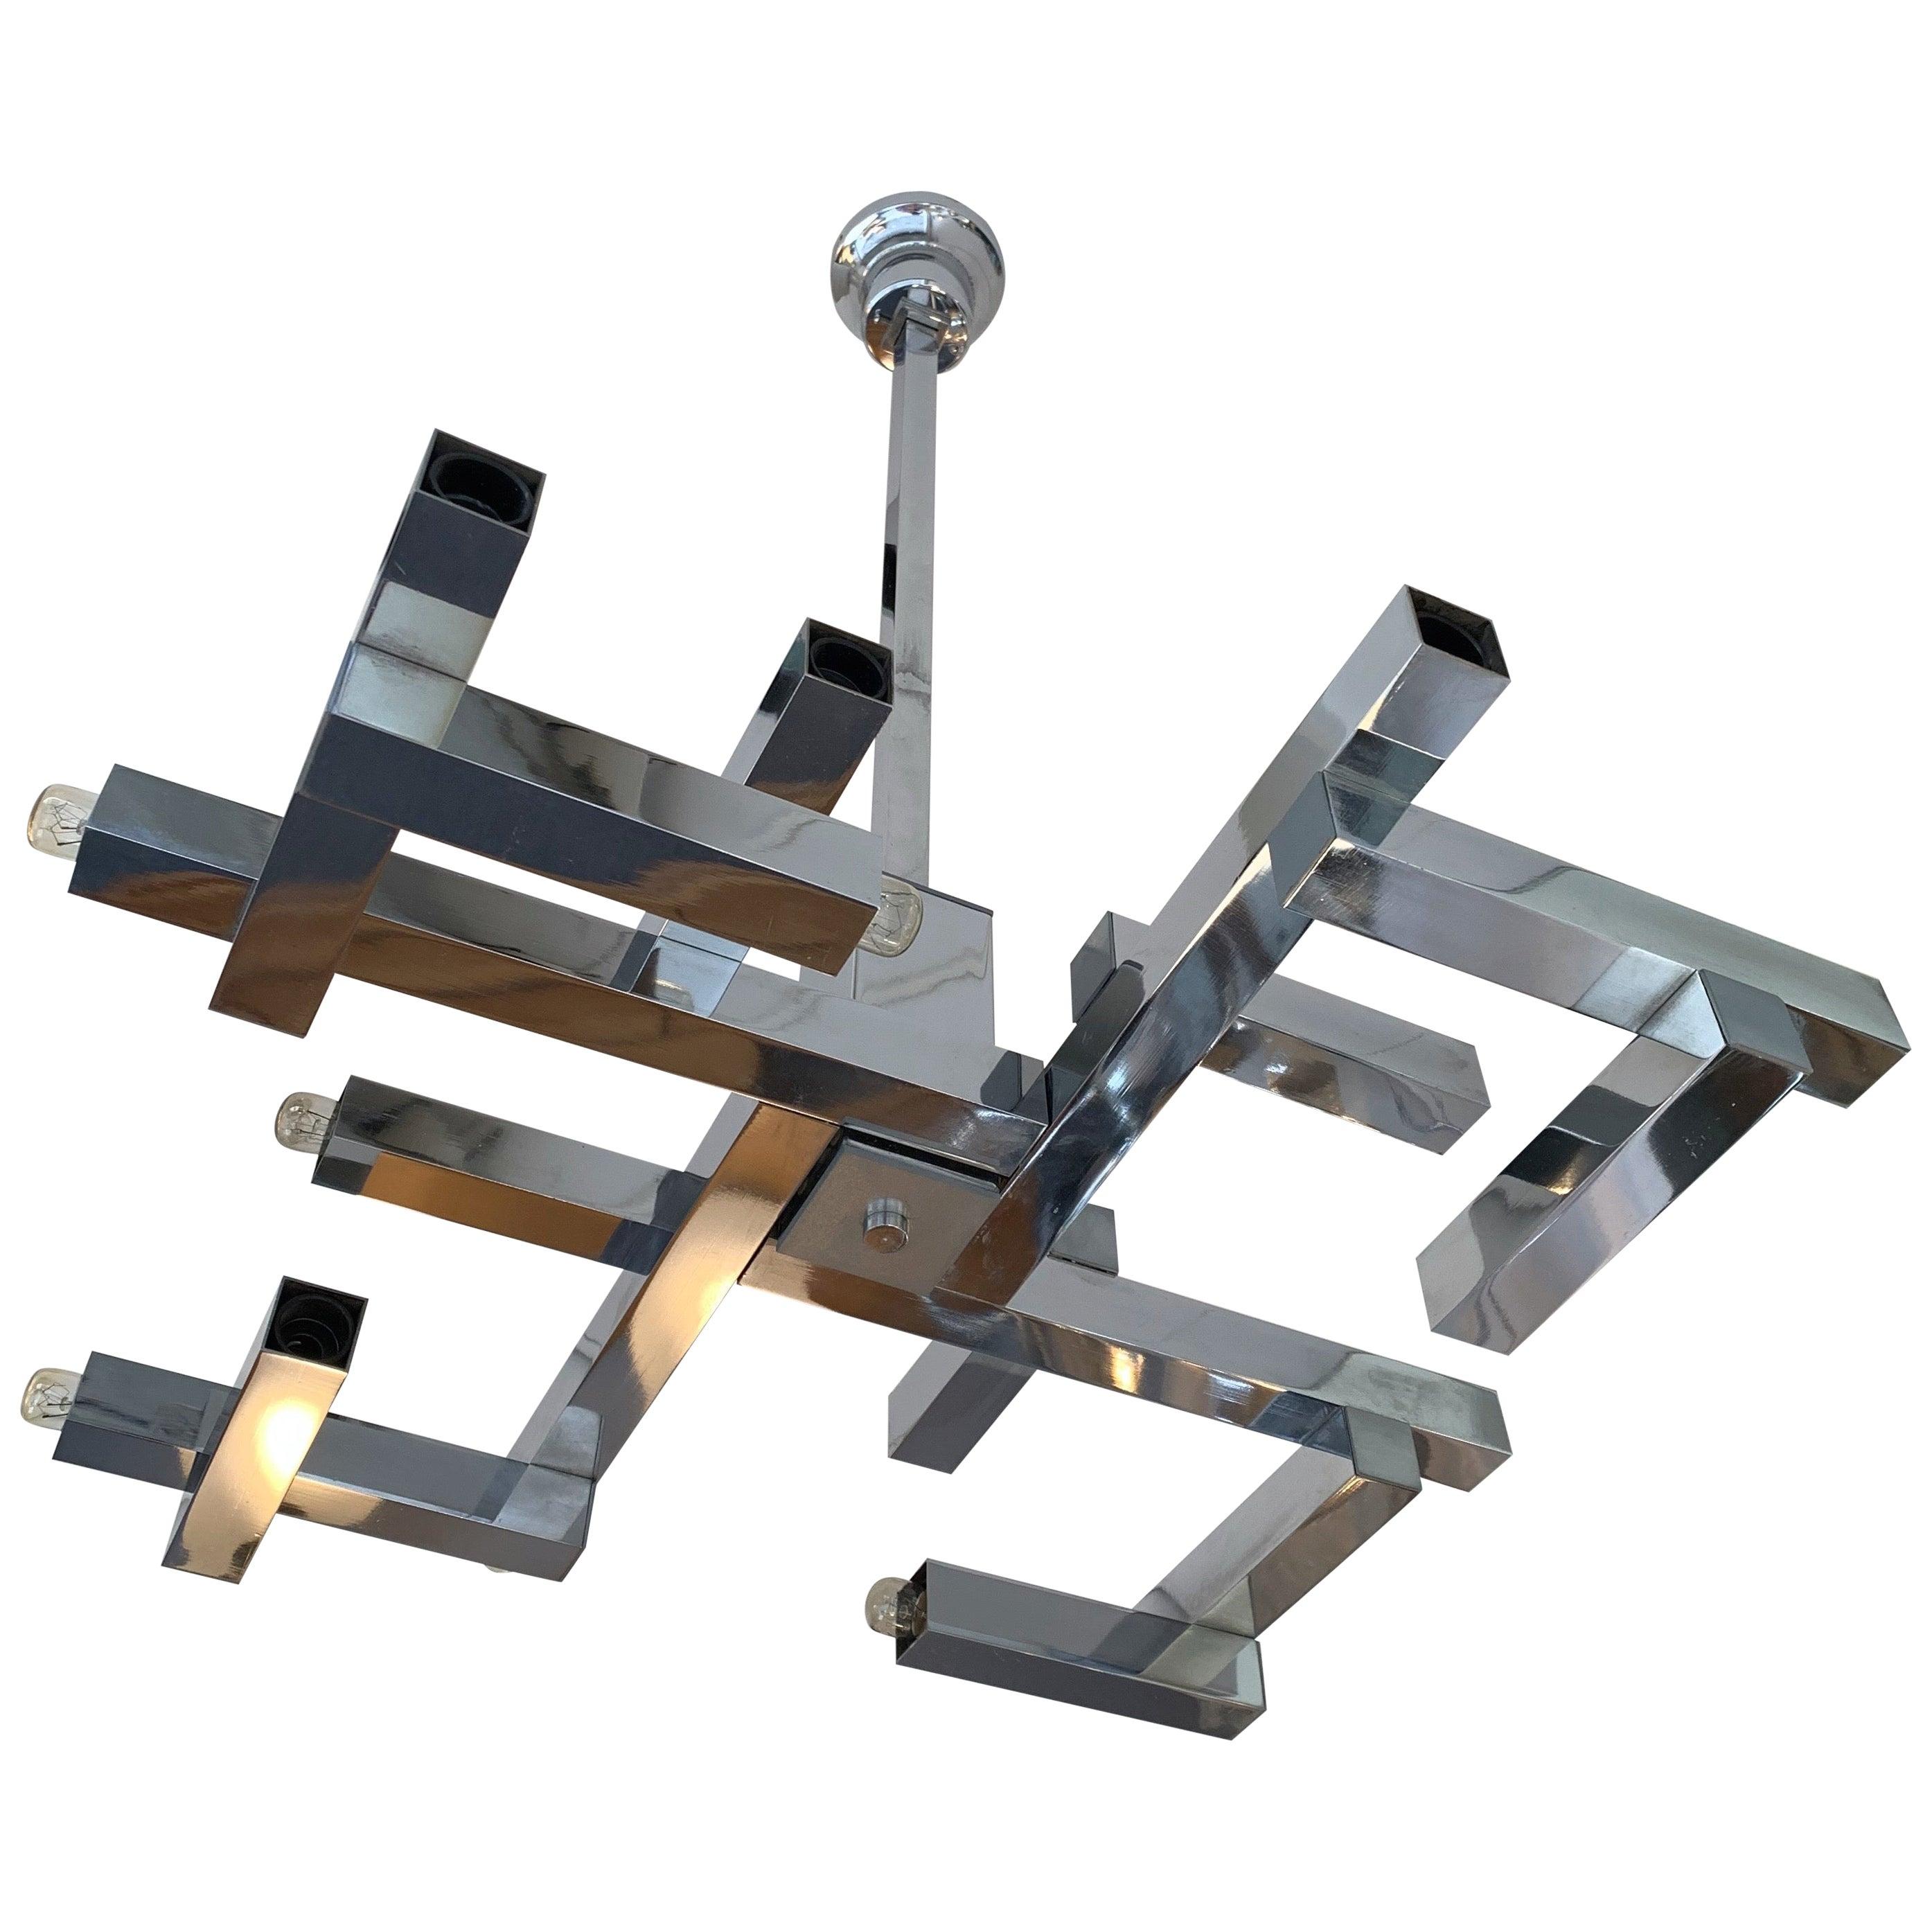 Chandelier Metal Chrome Futura by Sciolari, Italy, 1970s